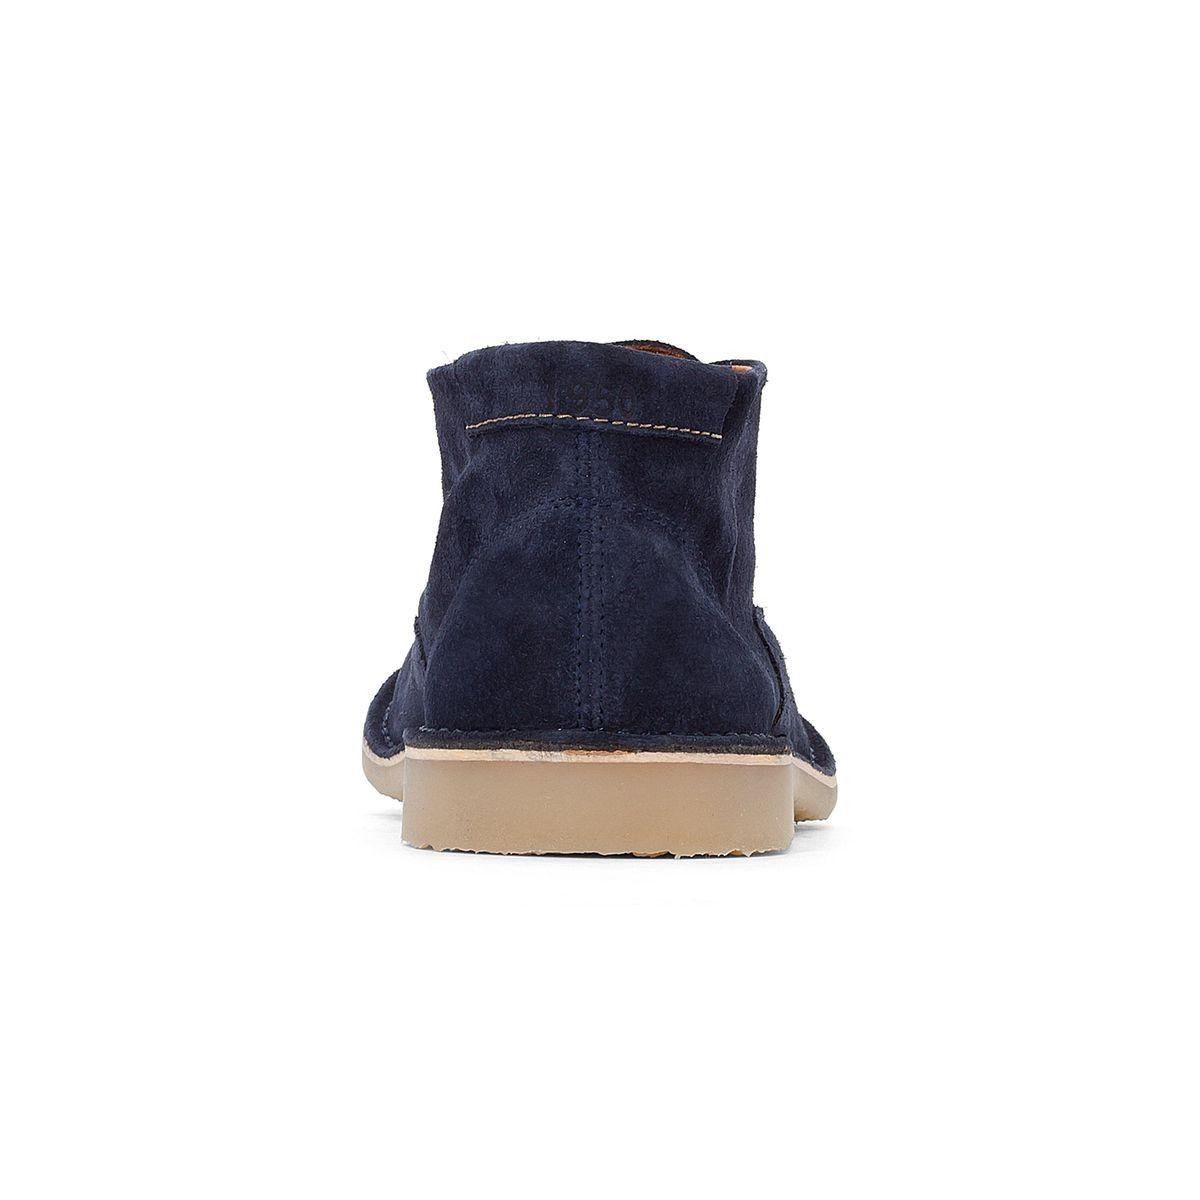 cuir croûte de de vachetteProductsCroute Boots cuir jRLA54